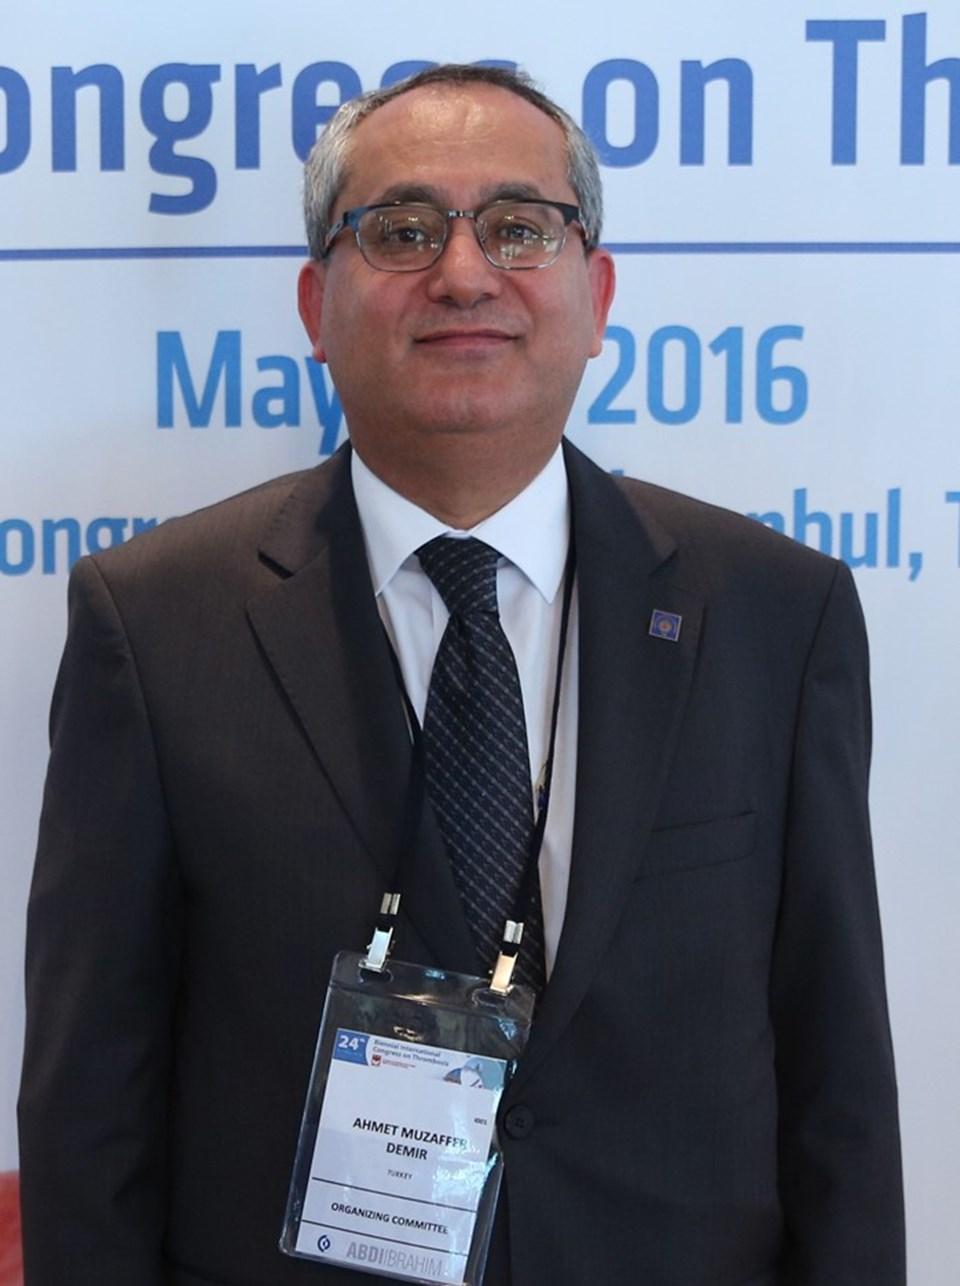 Prof. Dr. Ahmet Muzaffer Demir